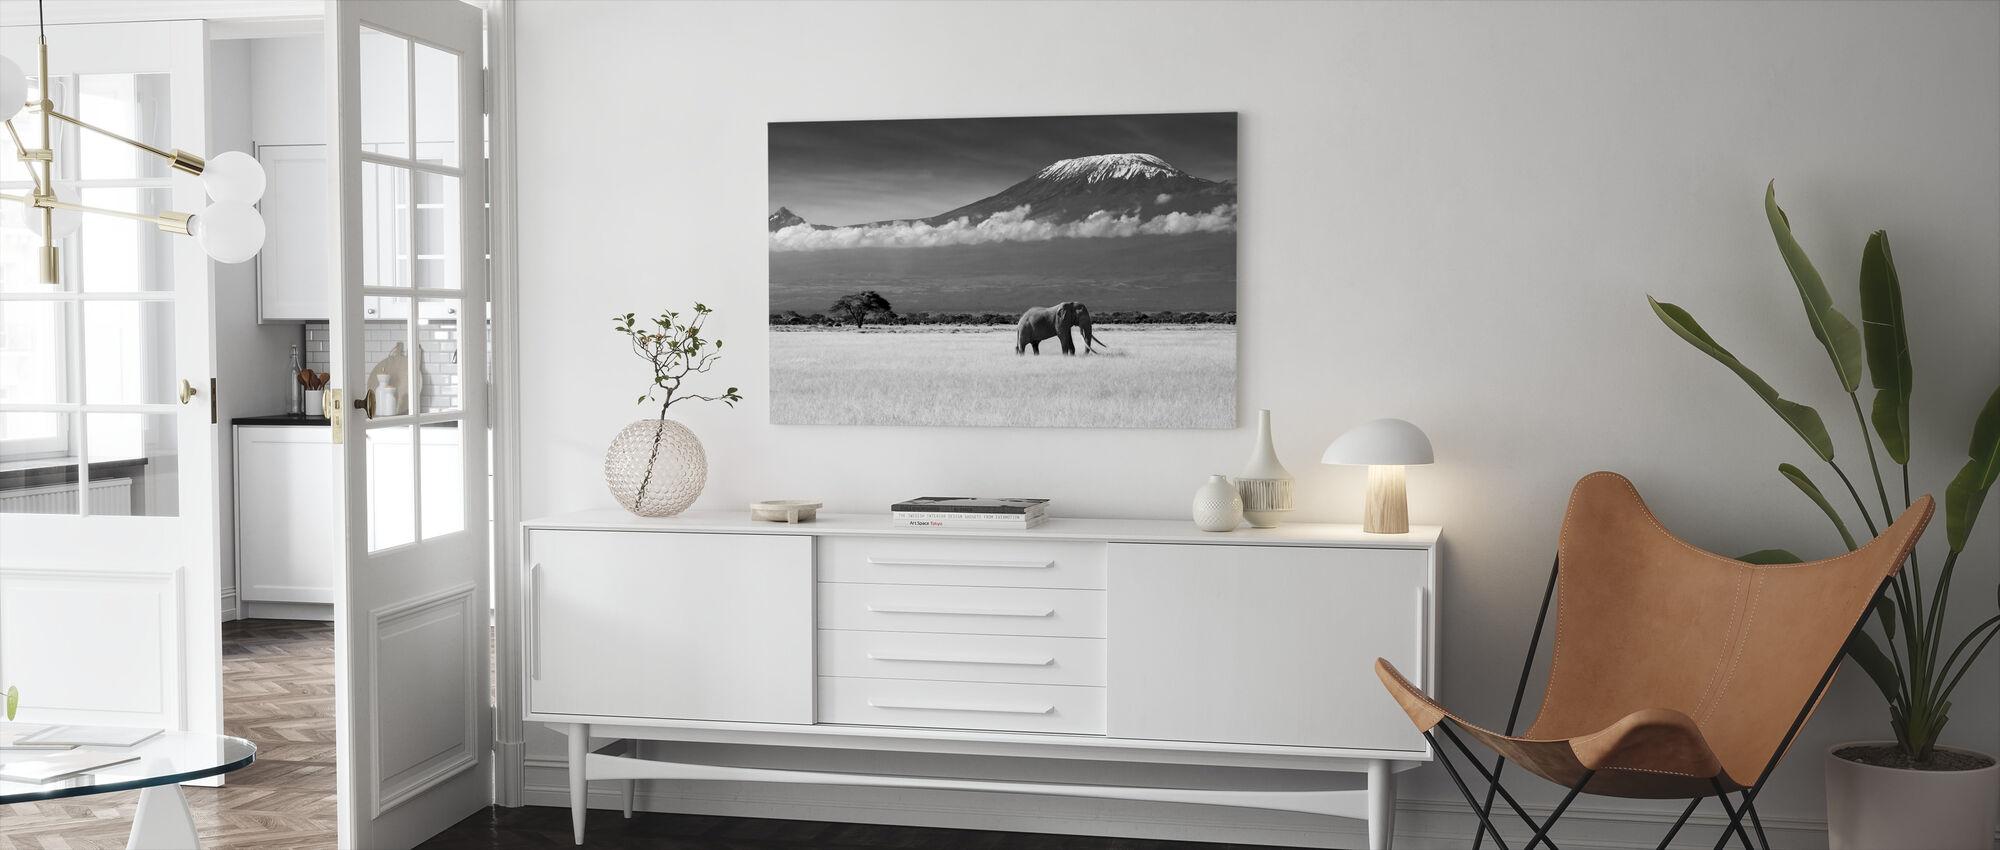 Olifantenlandschap - Canvas print - Woonkamer